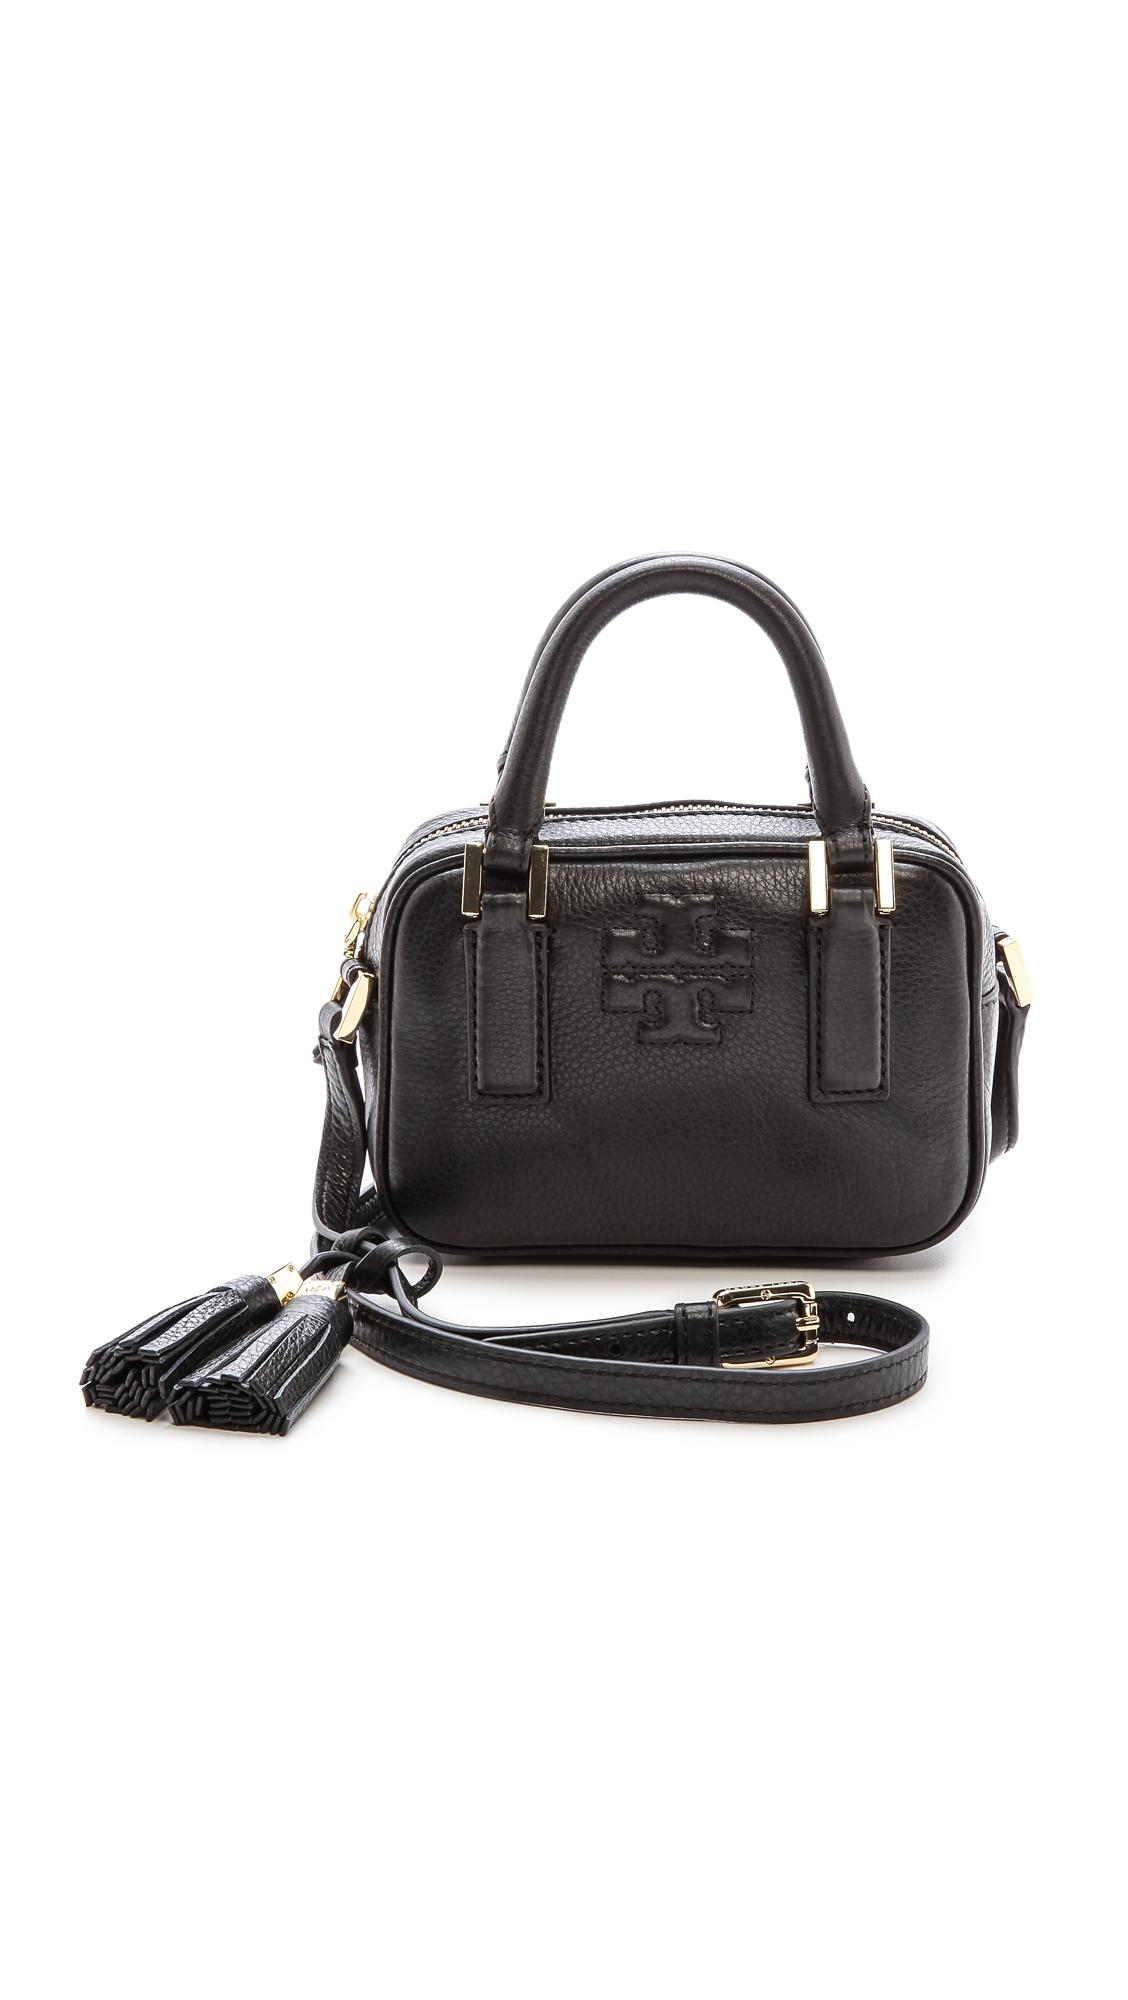 6ad5dd87d87 tory-burch-black-thea-mini-satchel-black-product-1-19977608-2-826216234-normal.jpeg